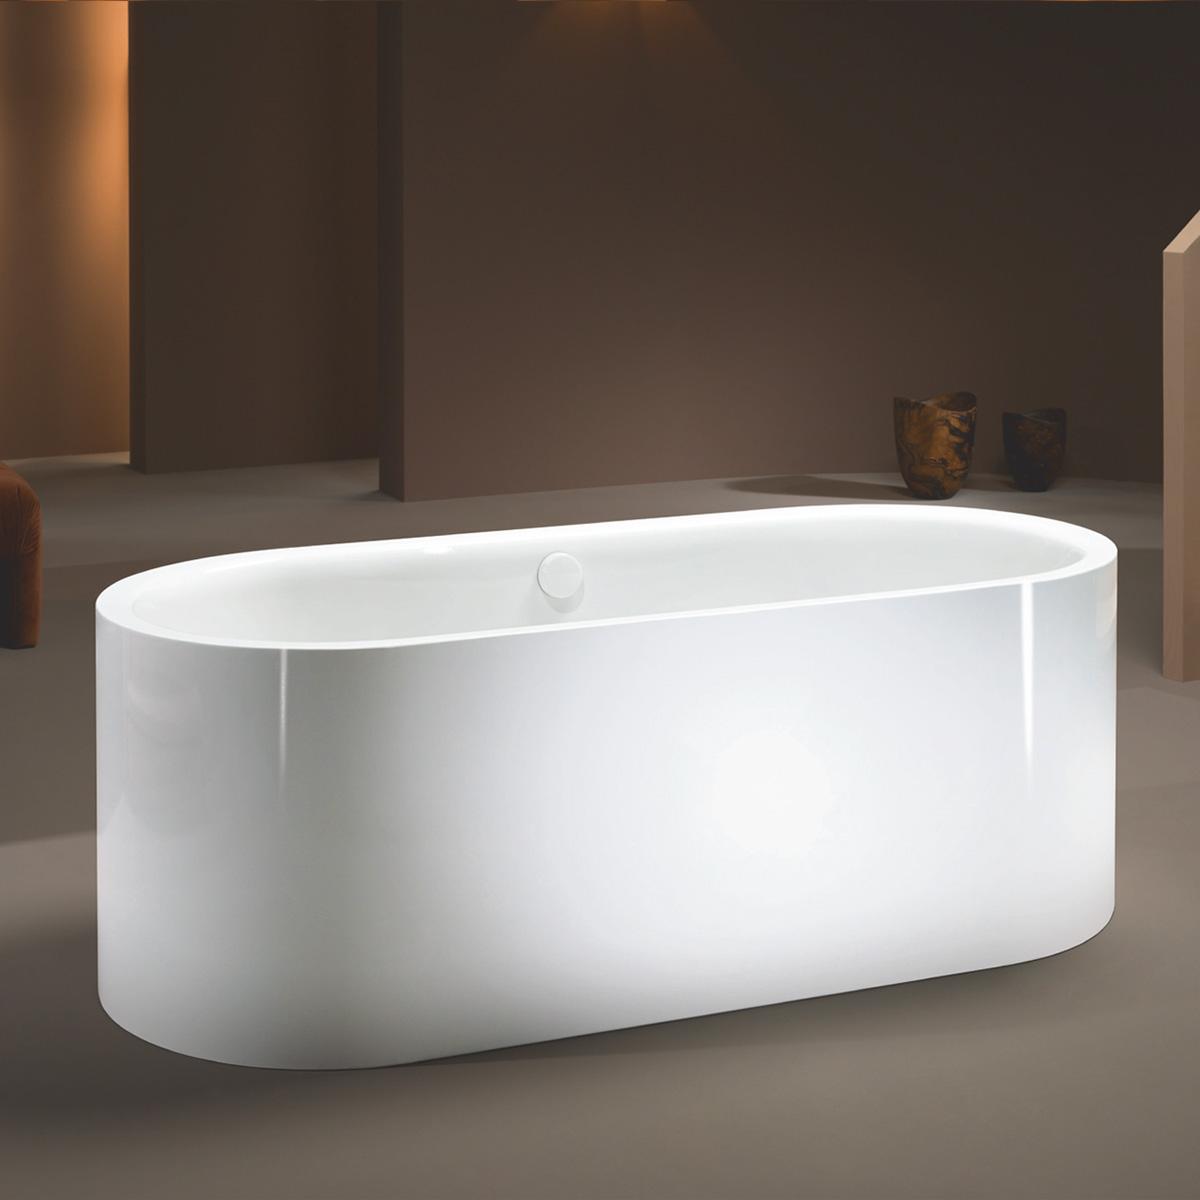 kaldewei meisterst ck centro duo oval 1127 freistehende. Black Bedroom Furniture Sets. Home Design Ideas